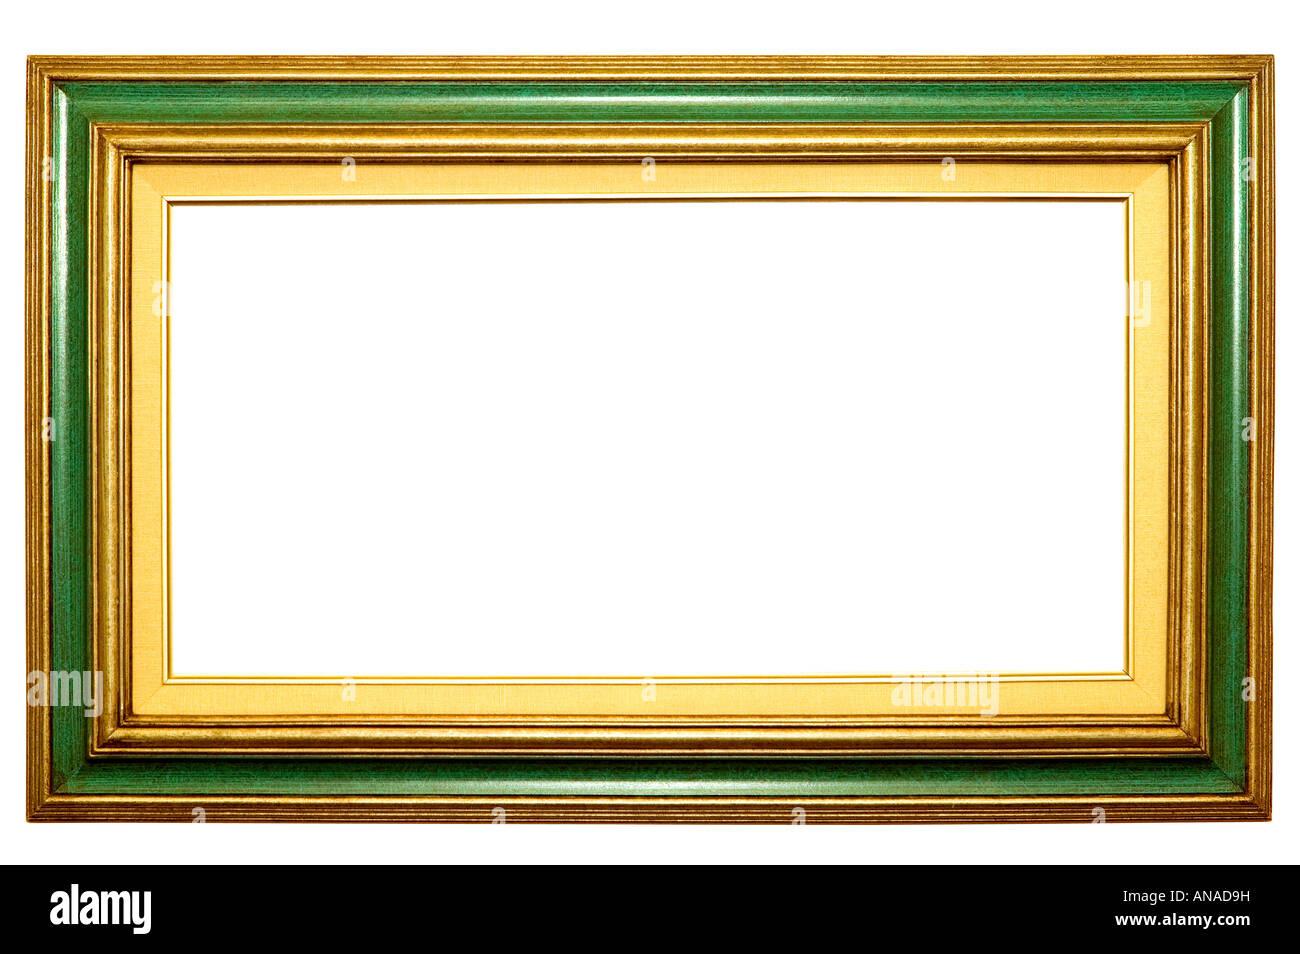 Picture Display Stockfotos & Picture Display Bilder - Alamy